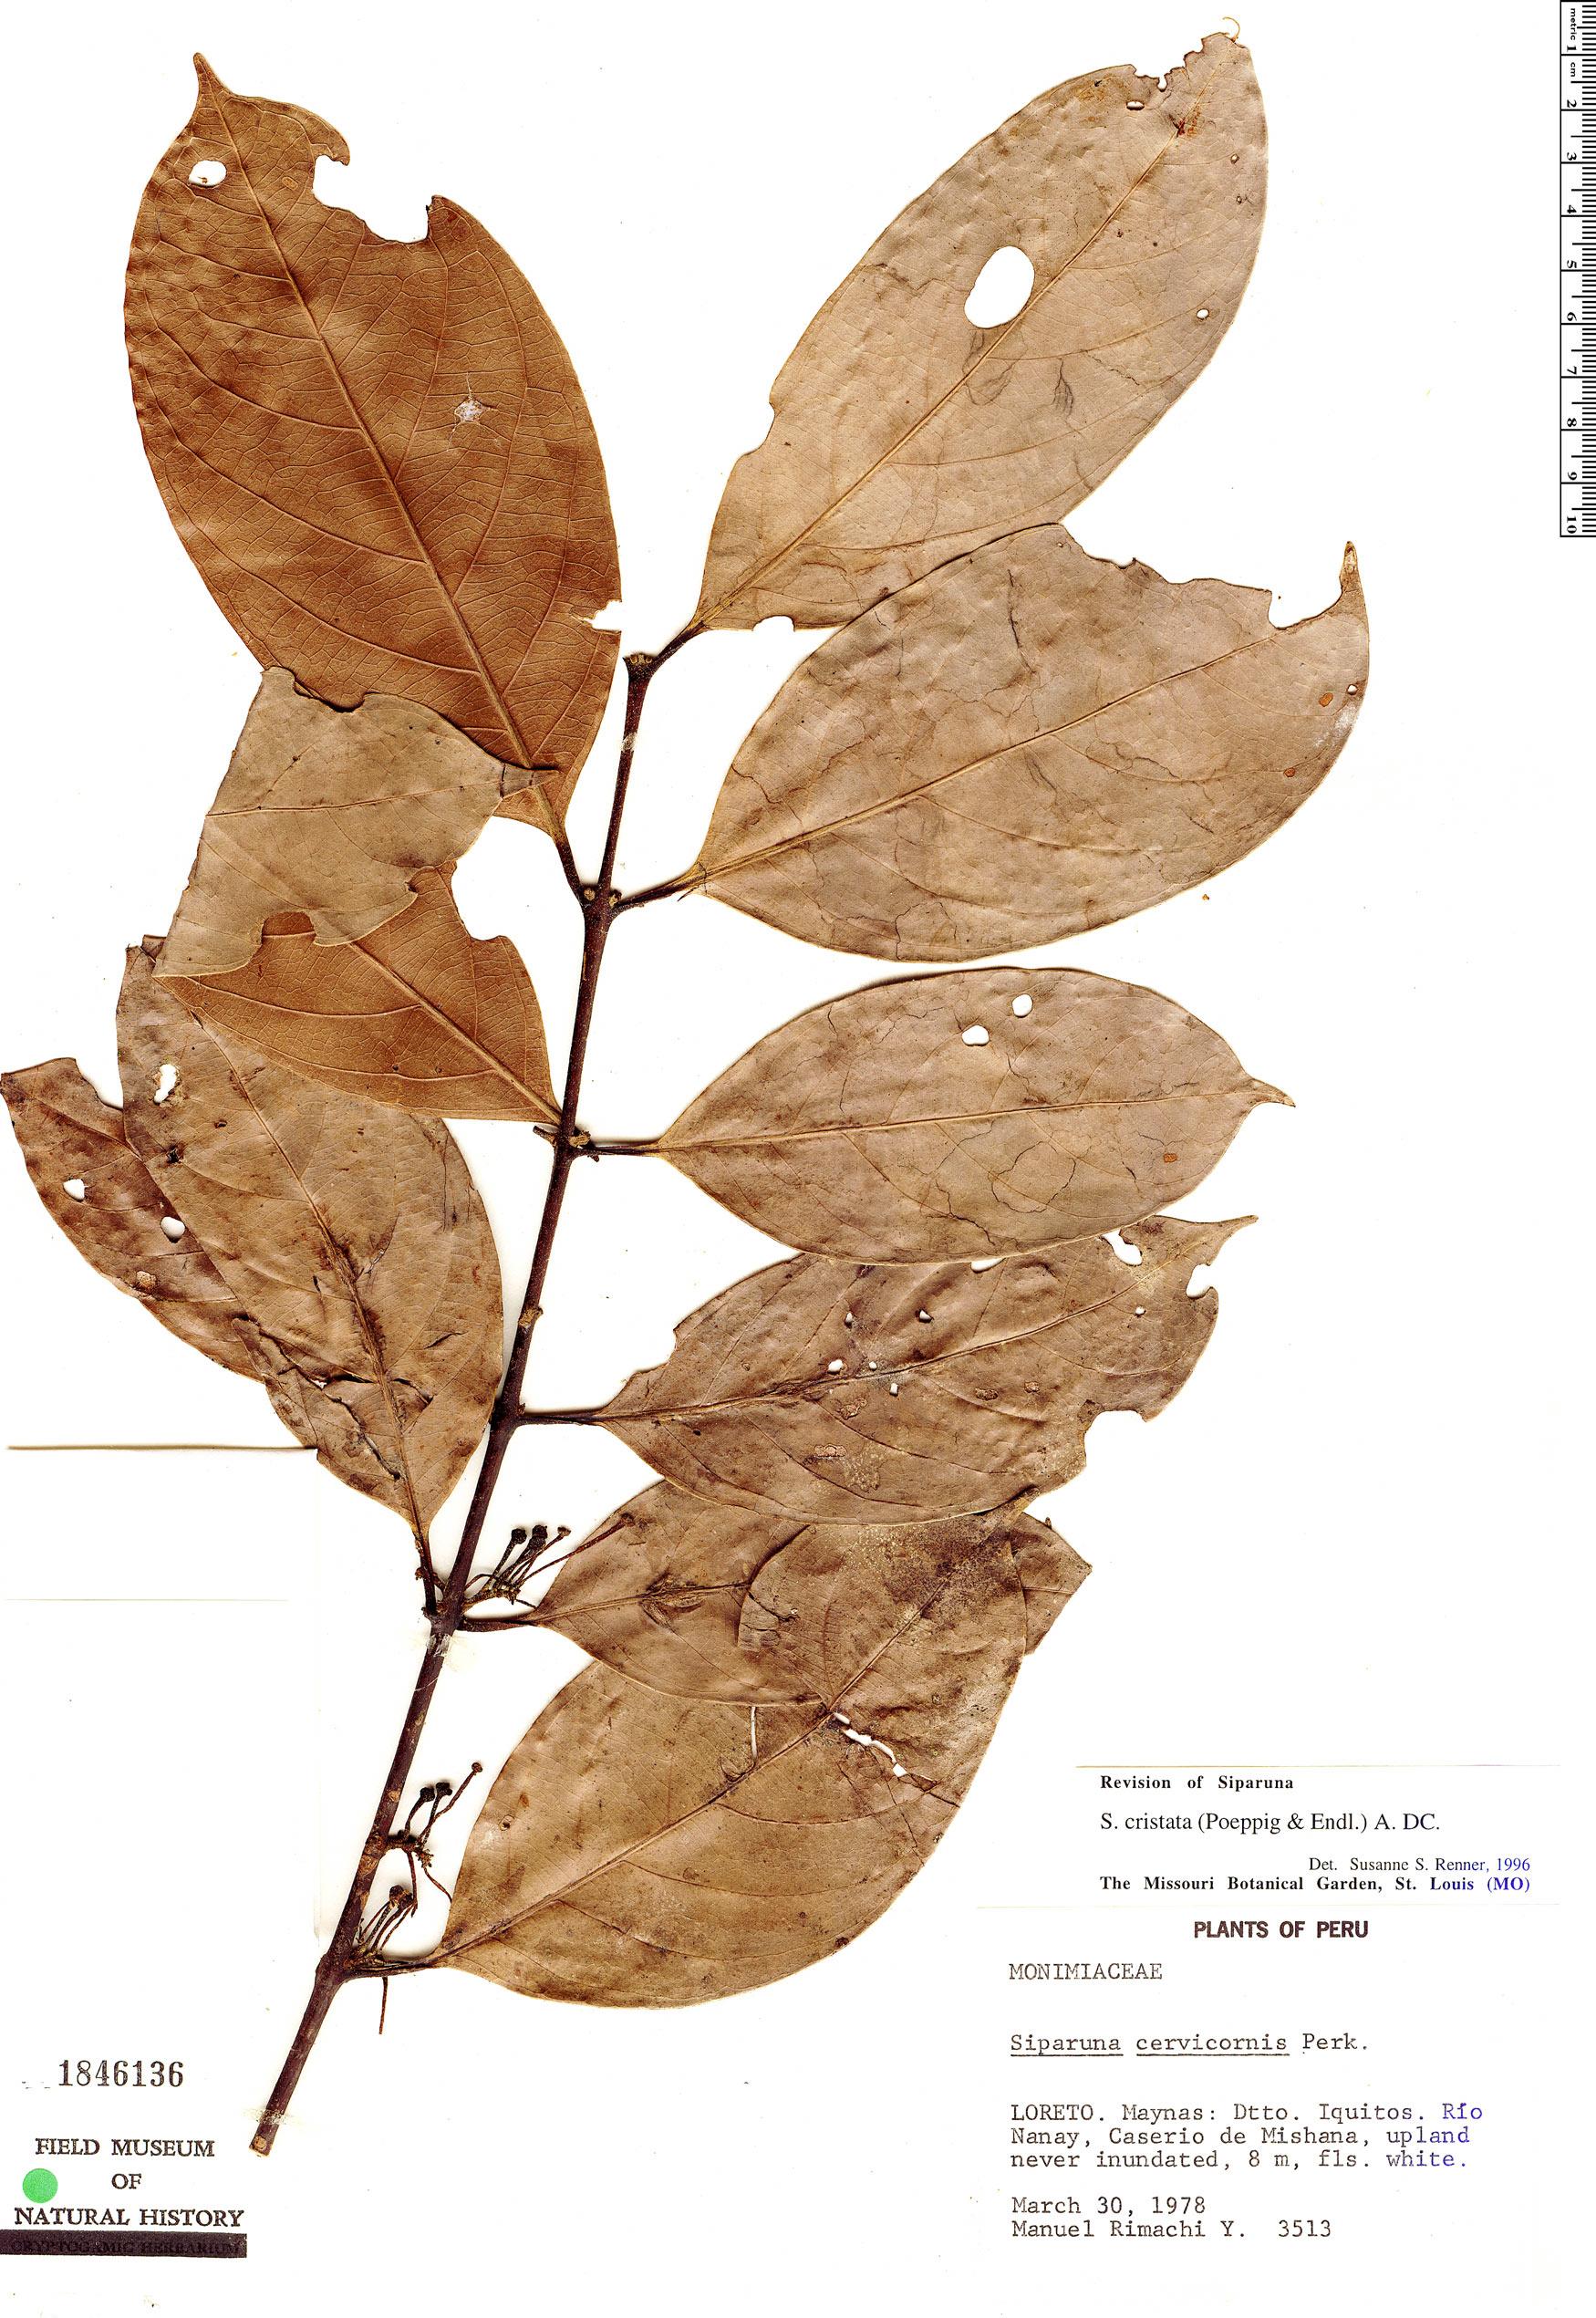 Specimen: Siparuna cristata